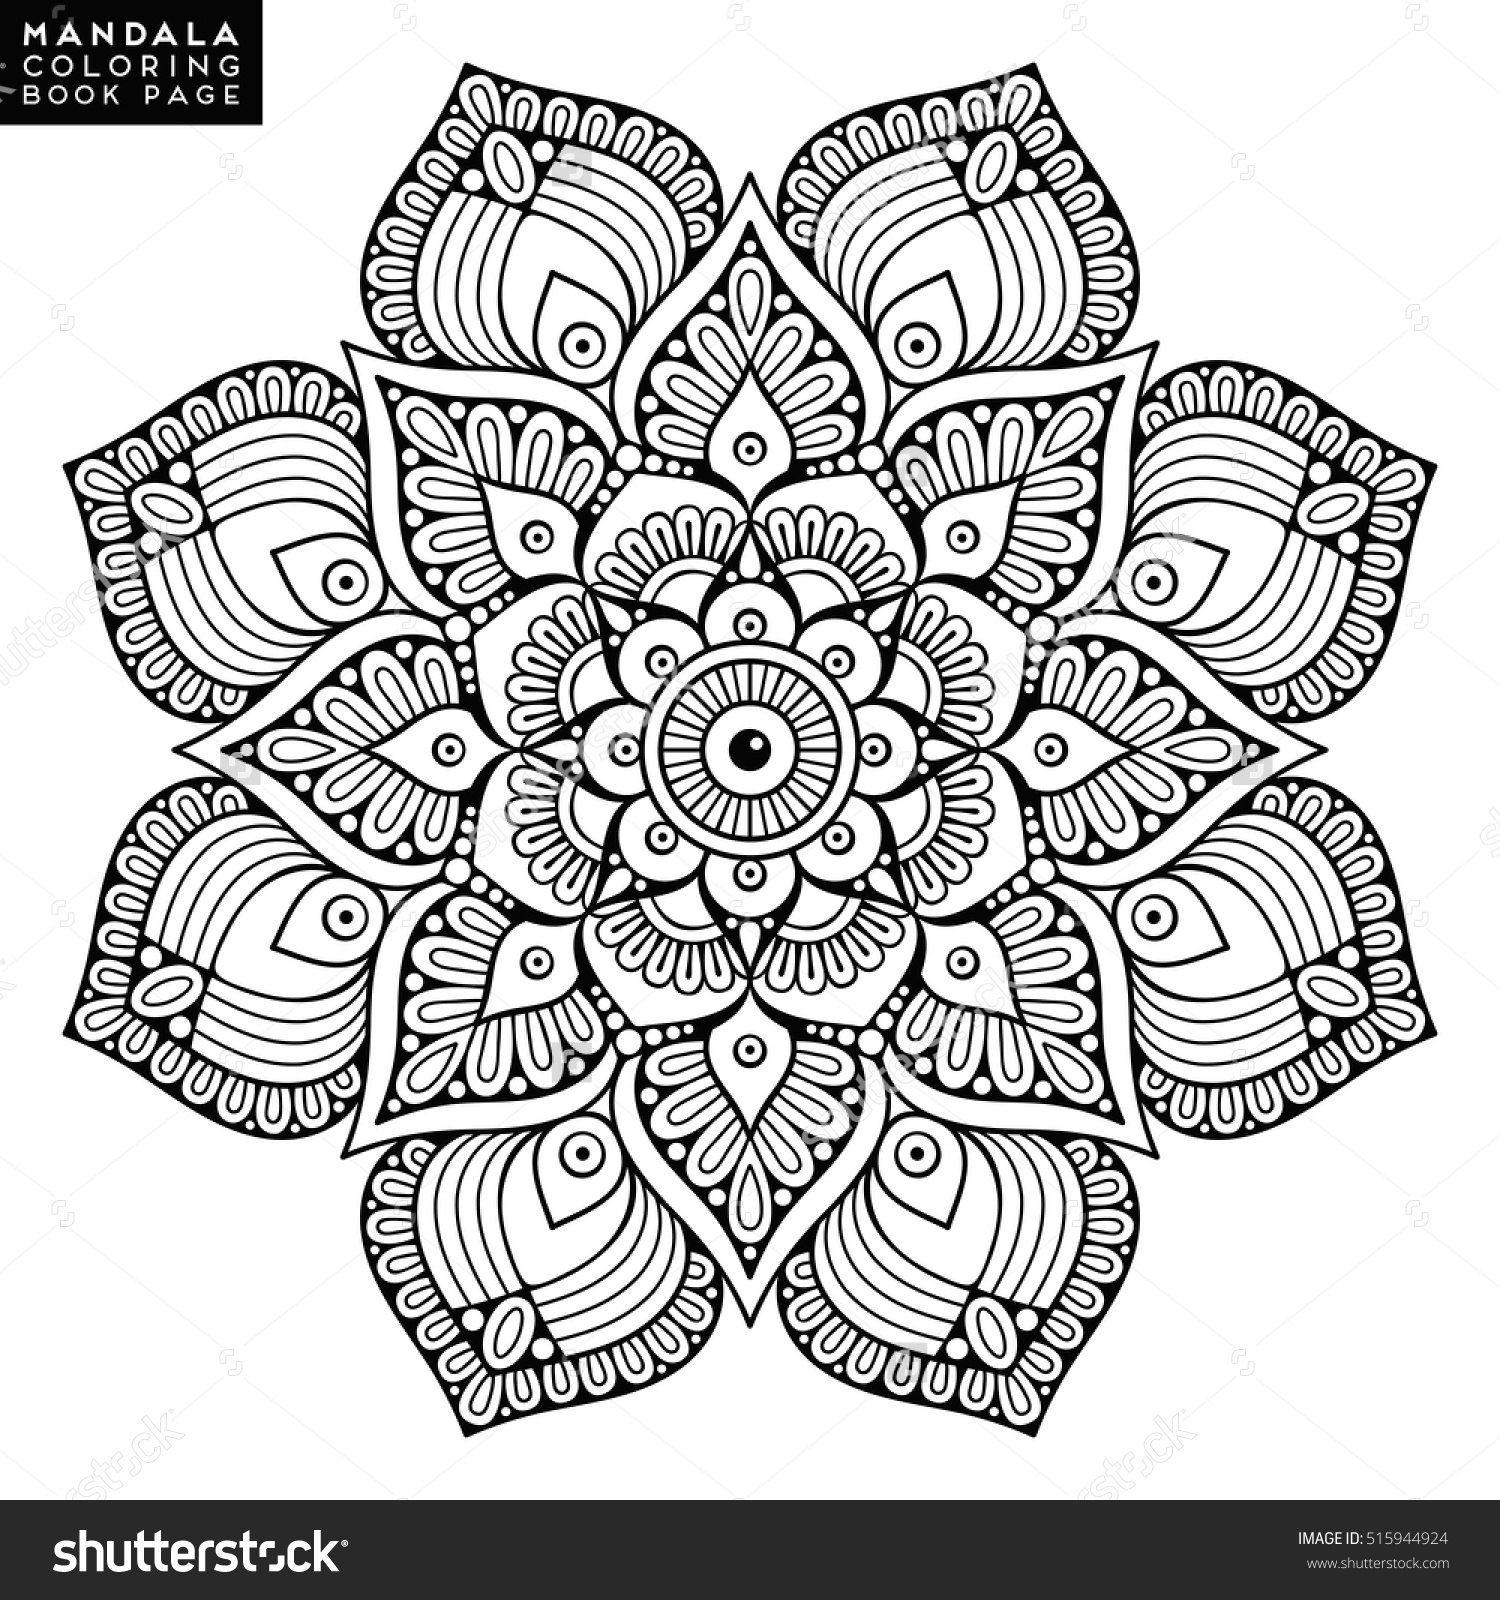 Новости  Mandala malvorlagen, Mandala muster, Malvorlagen